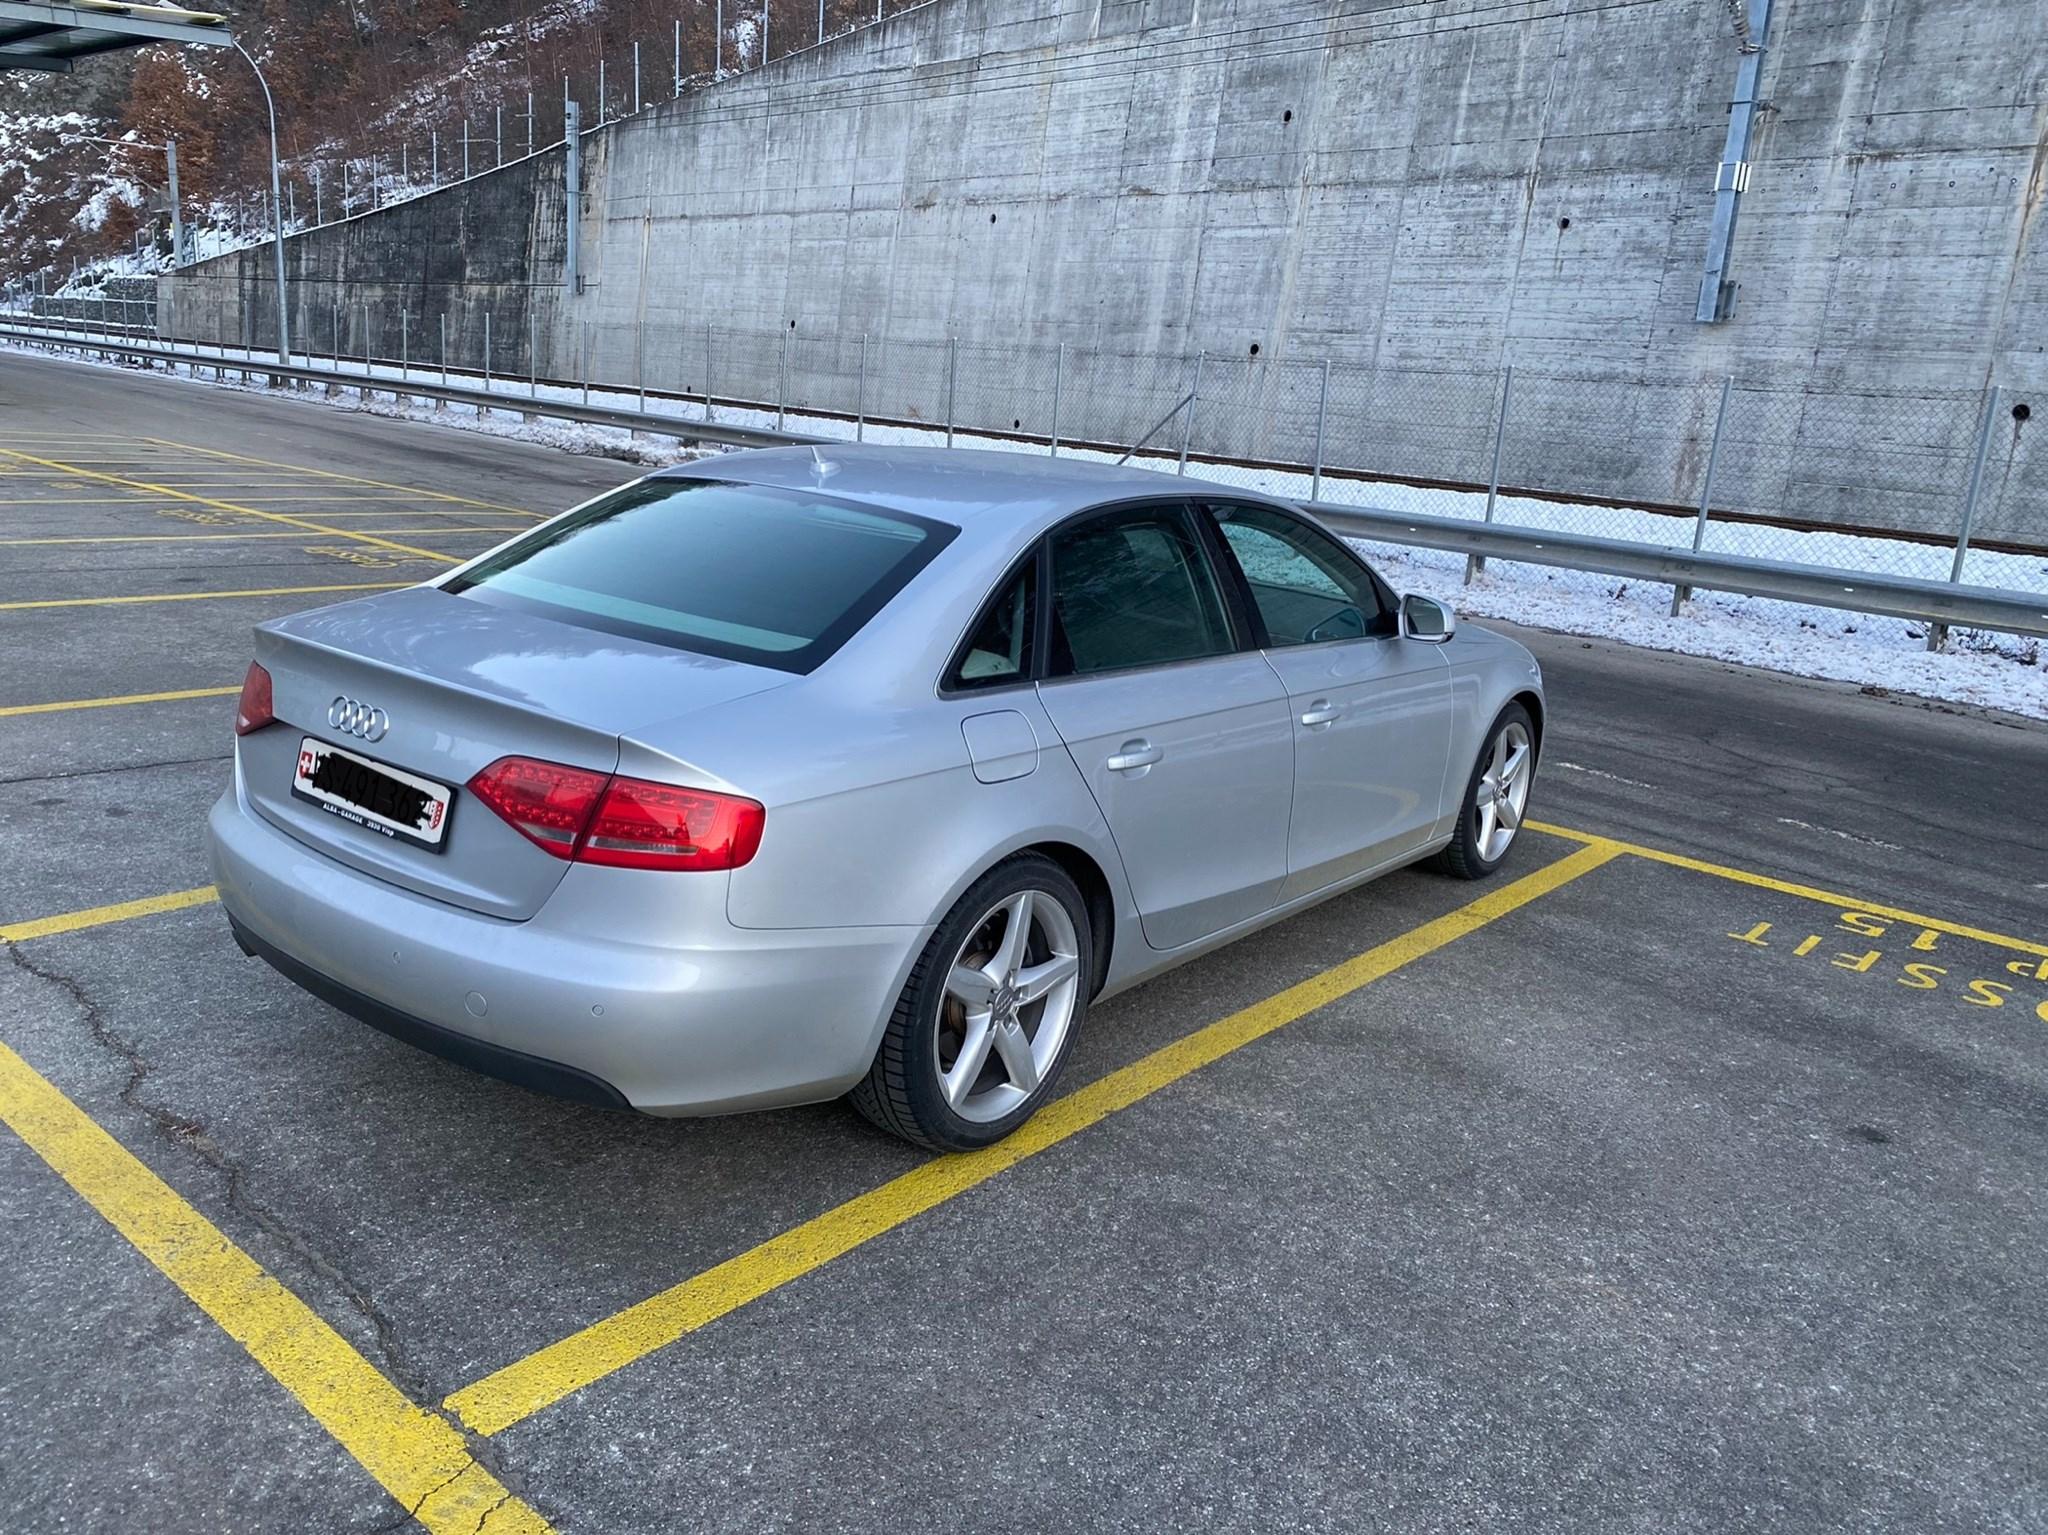 Audi A4 2.0 TFSI 211 quattro